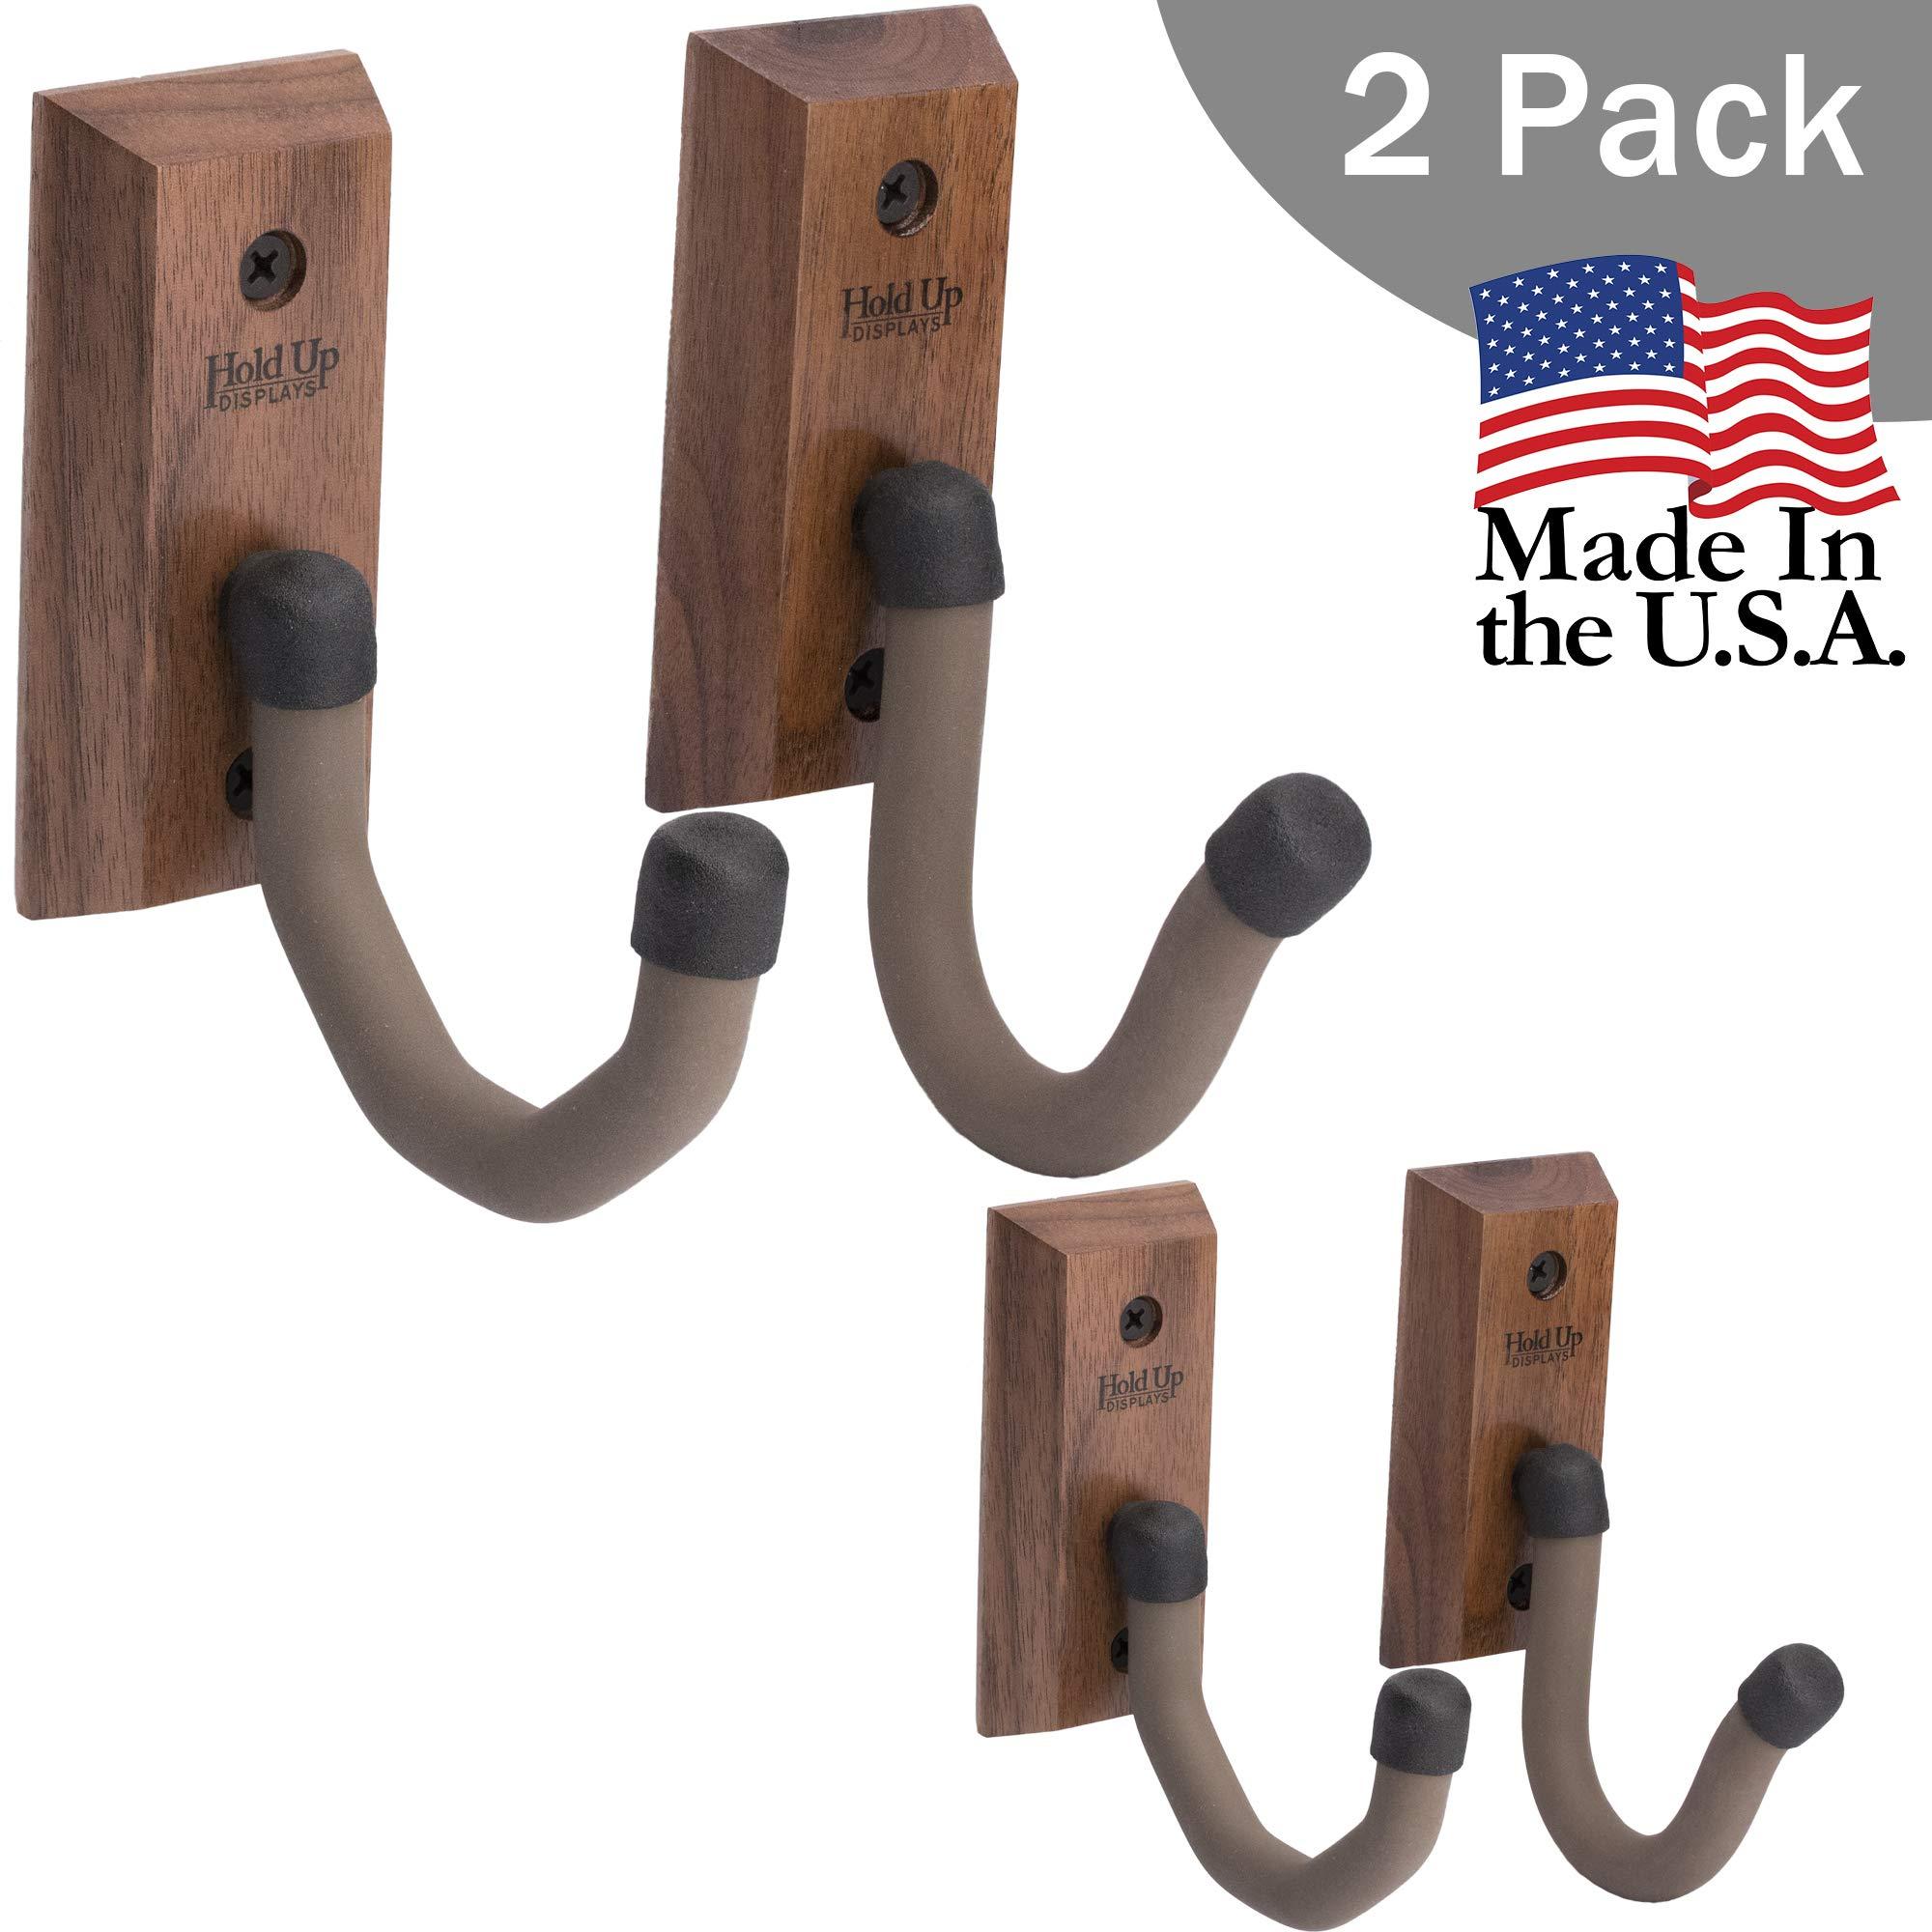 Hold Up Displays - Horizontal Gun Rack Hooks Hanger Storage for Any Rifle Shotgun Bow - USA Made - Black Walnut 2-Pack by Hold Up Displays